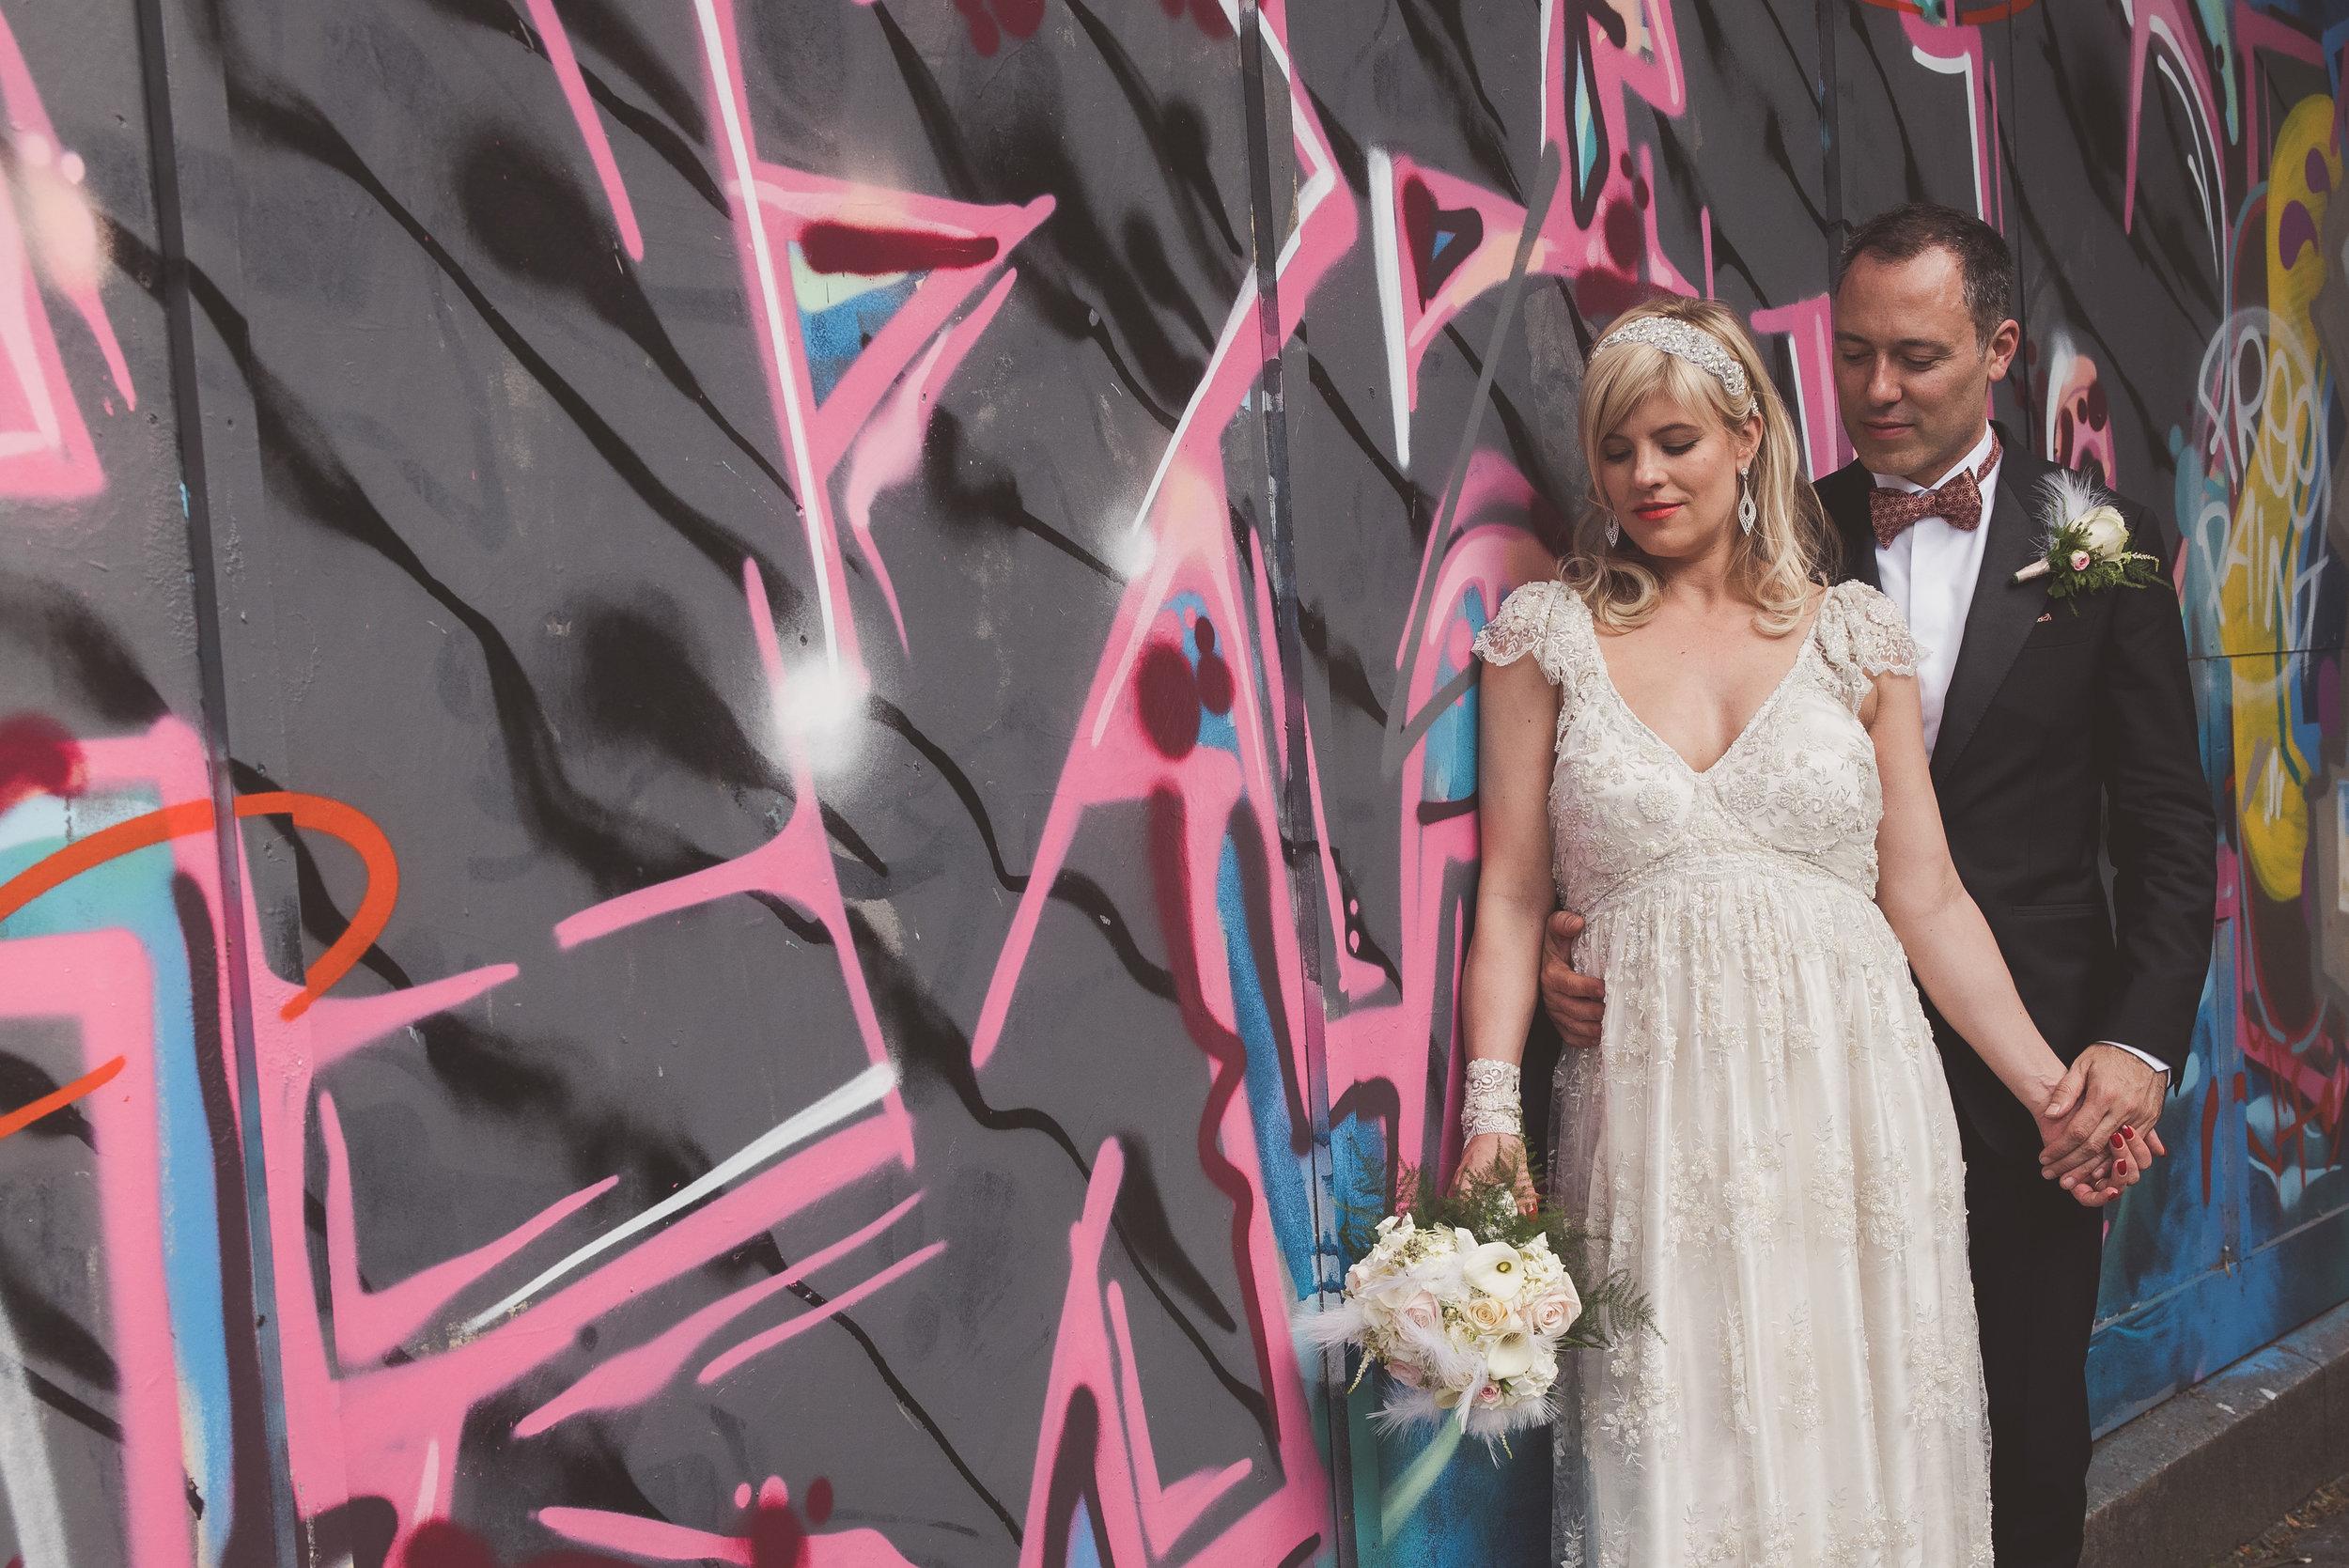 London wedding photography. Urban wedding photos.